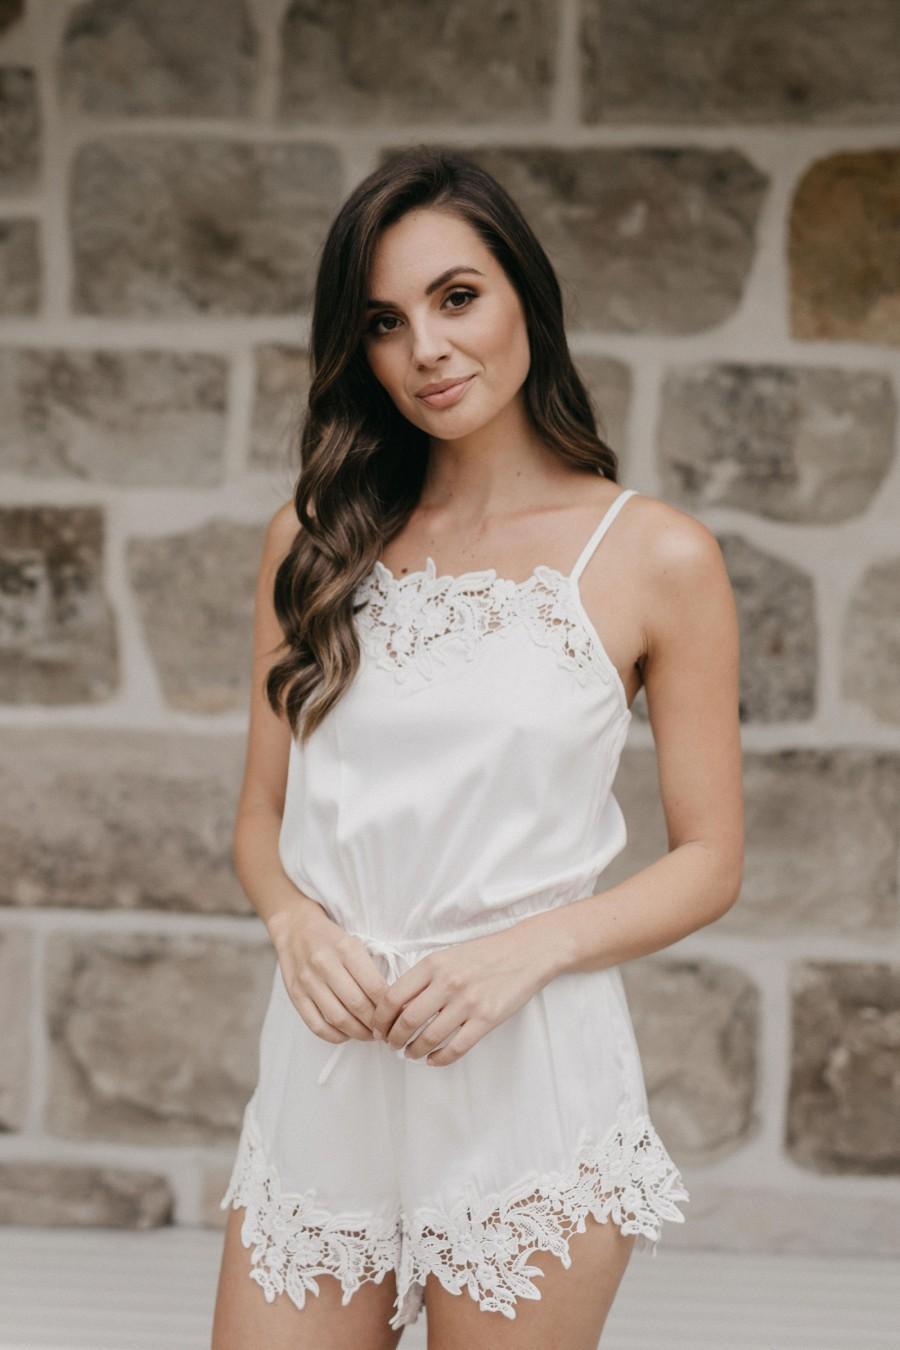 Hochzeit - Satin Playsuit / Lace Bridal Robe / Bridesmaid Robes / Robe / Bridal Robe / Bride Robe / Bridal Party Robes / ALAINA